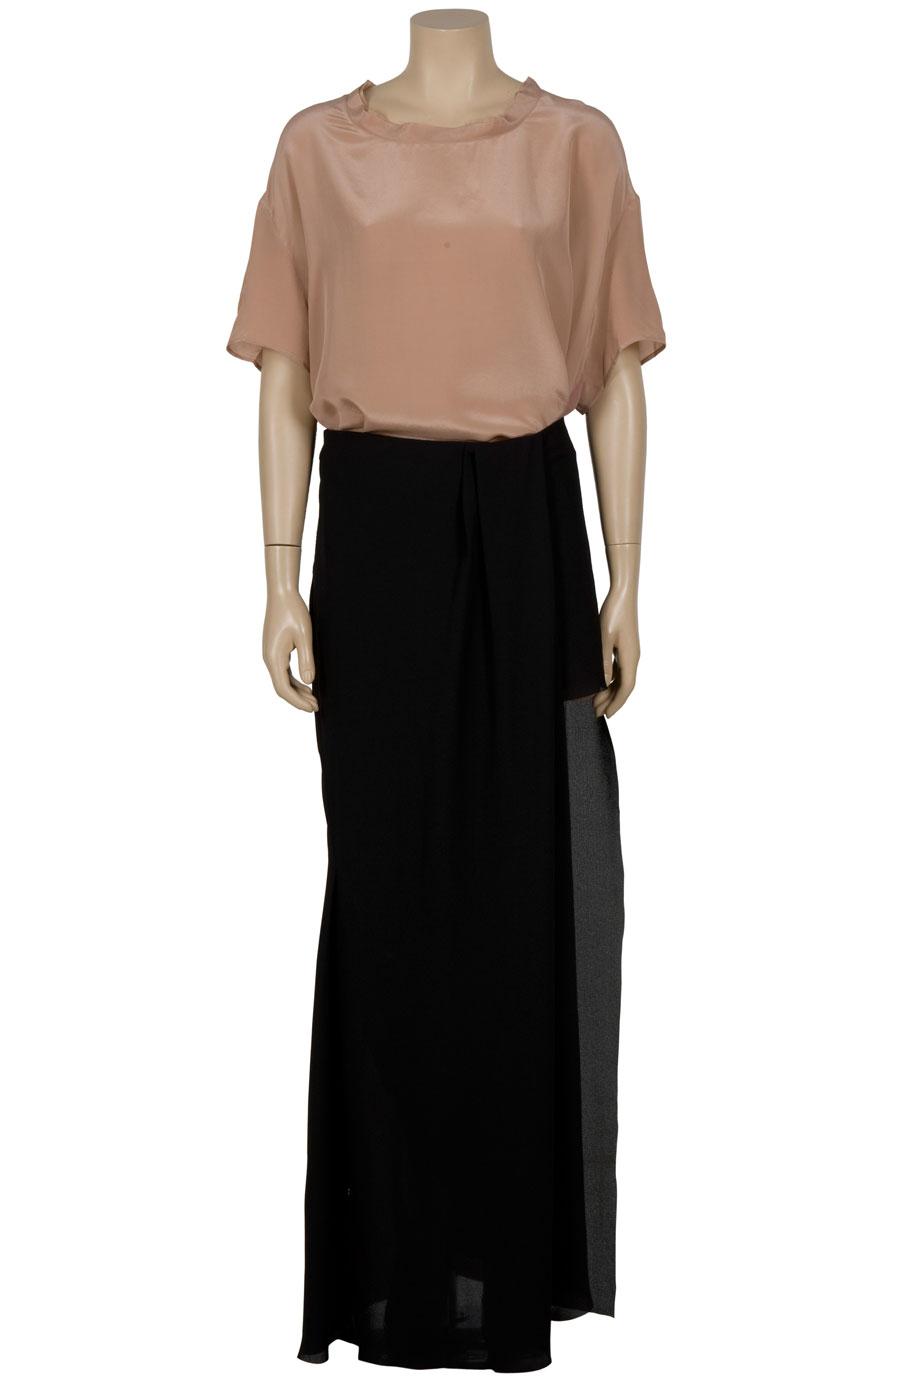 Acne studios Maxi Mini Cutout Skirt in Black | Lyst